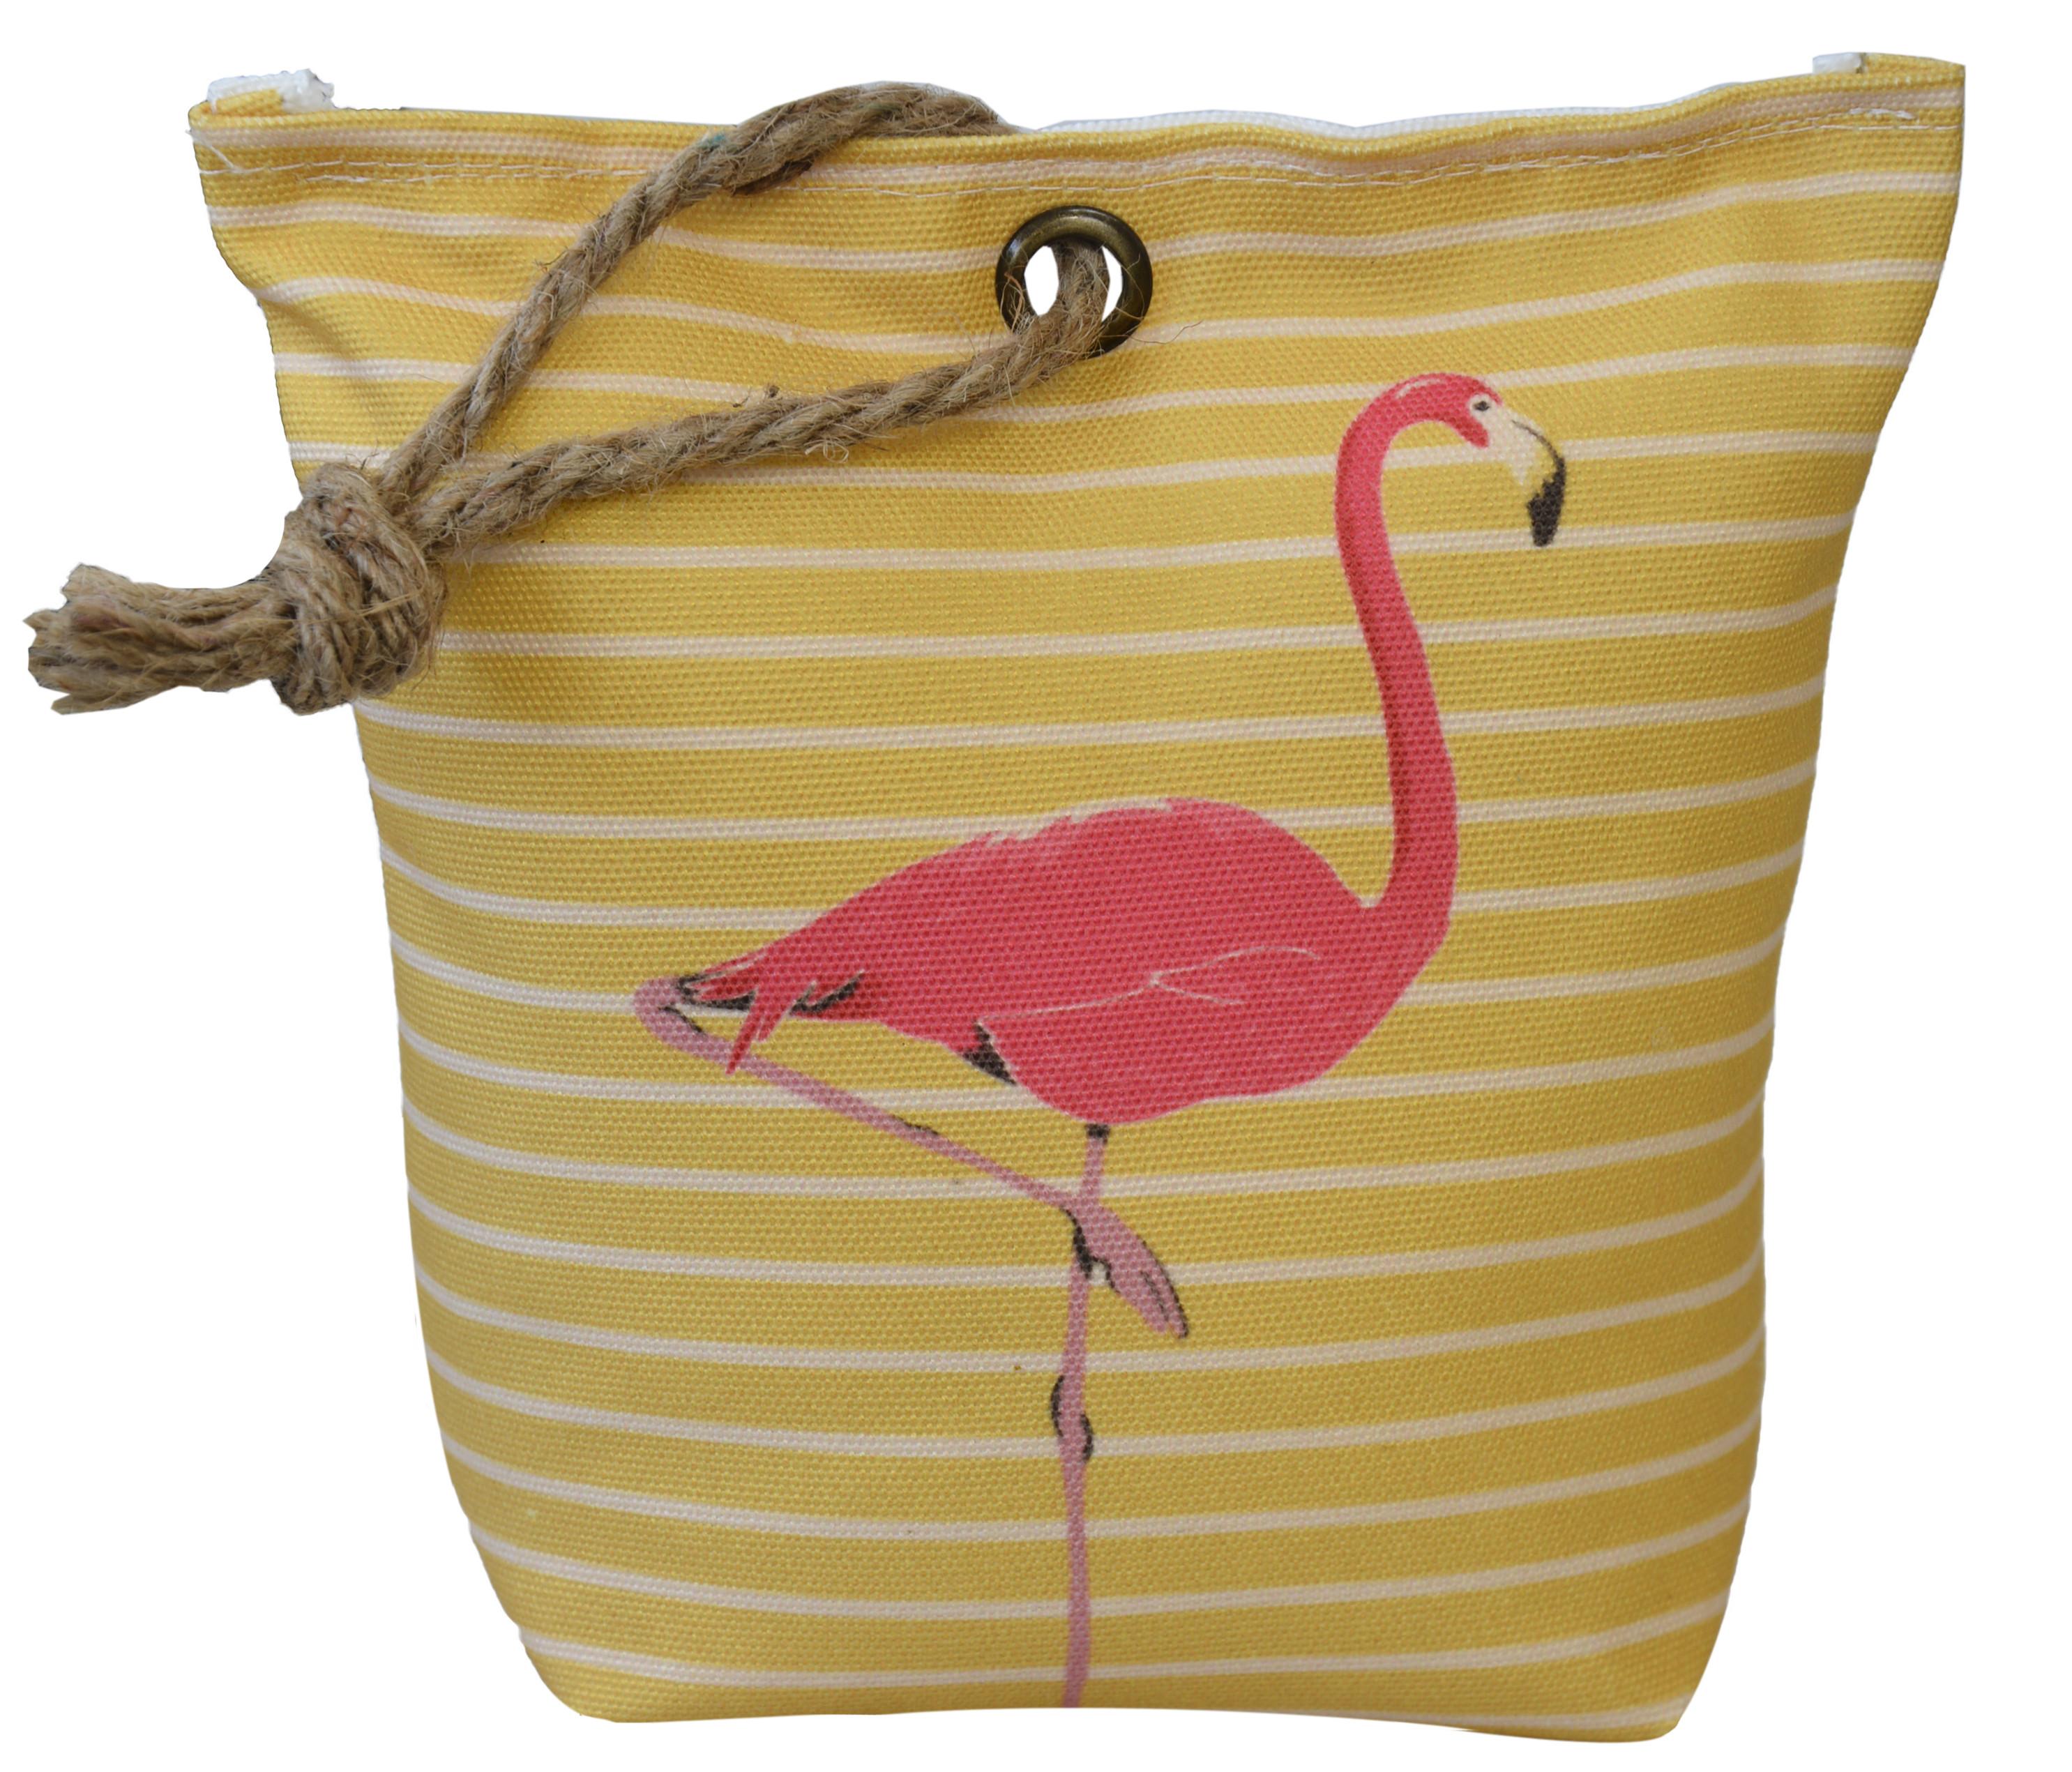 Sujetapuertas Decorative Textile, Flamenco 1,3 kg Sack Yellow with Sisal Natural for Doors 19x19x8 cm